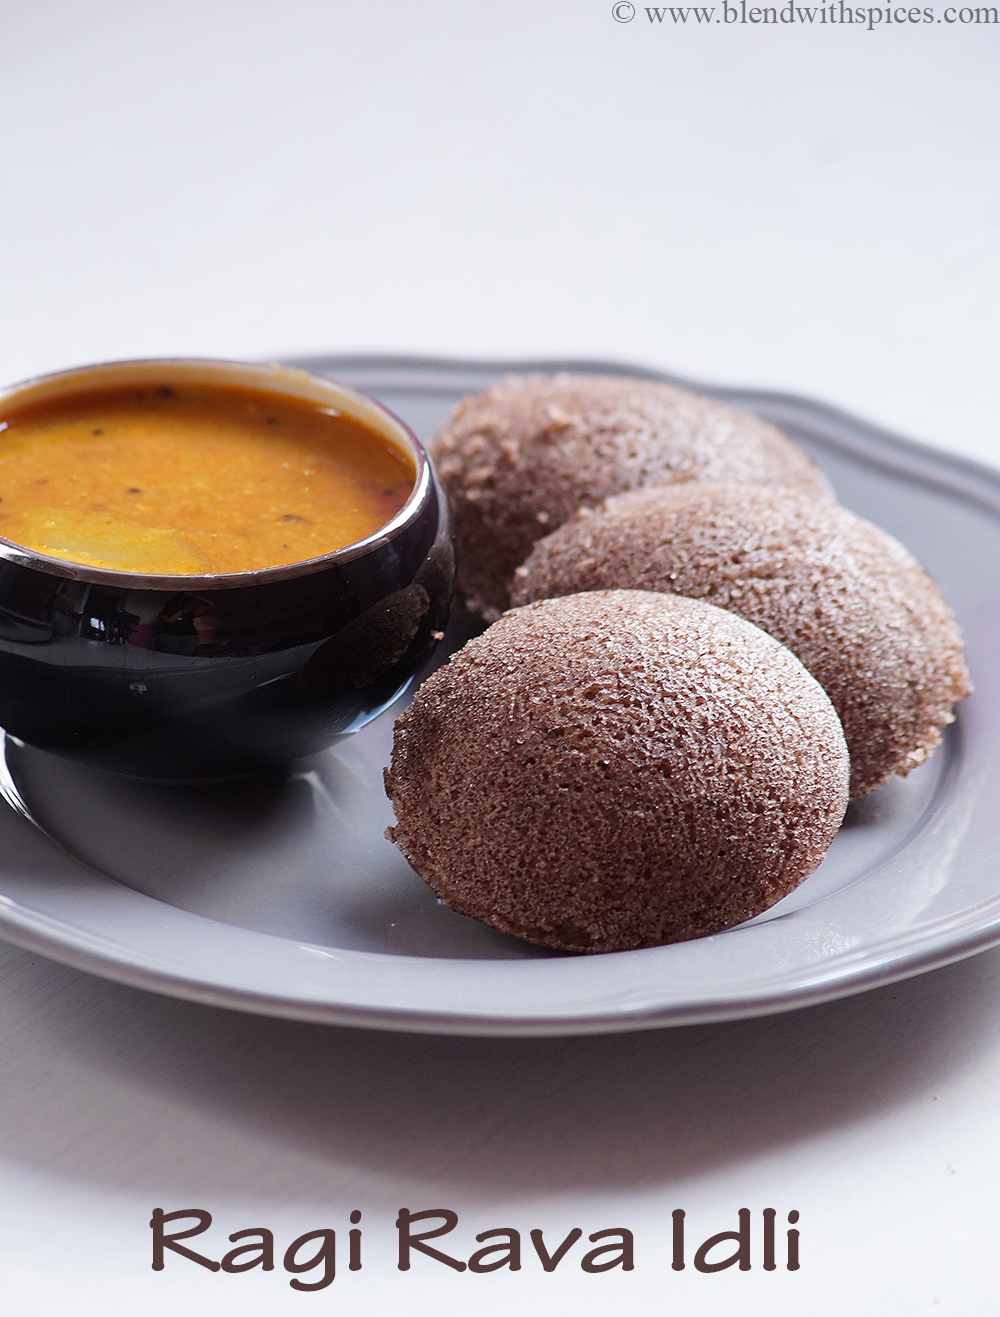 A plate of soft ragi idli with sambar